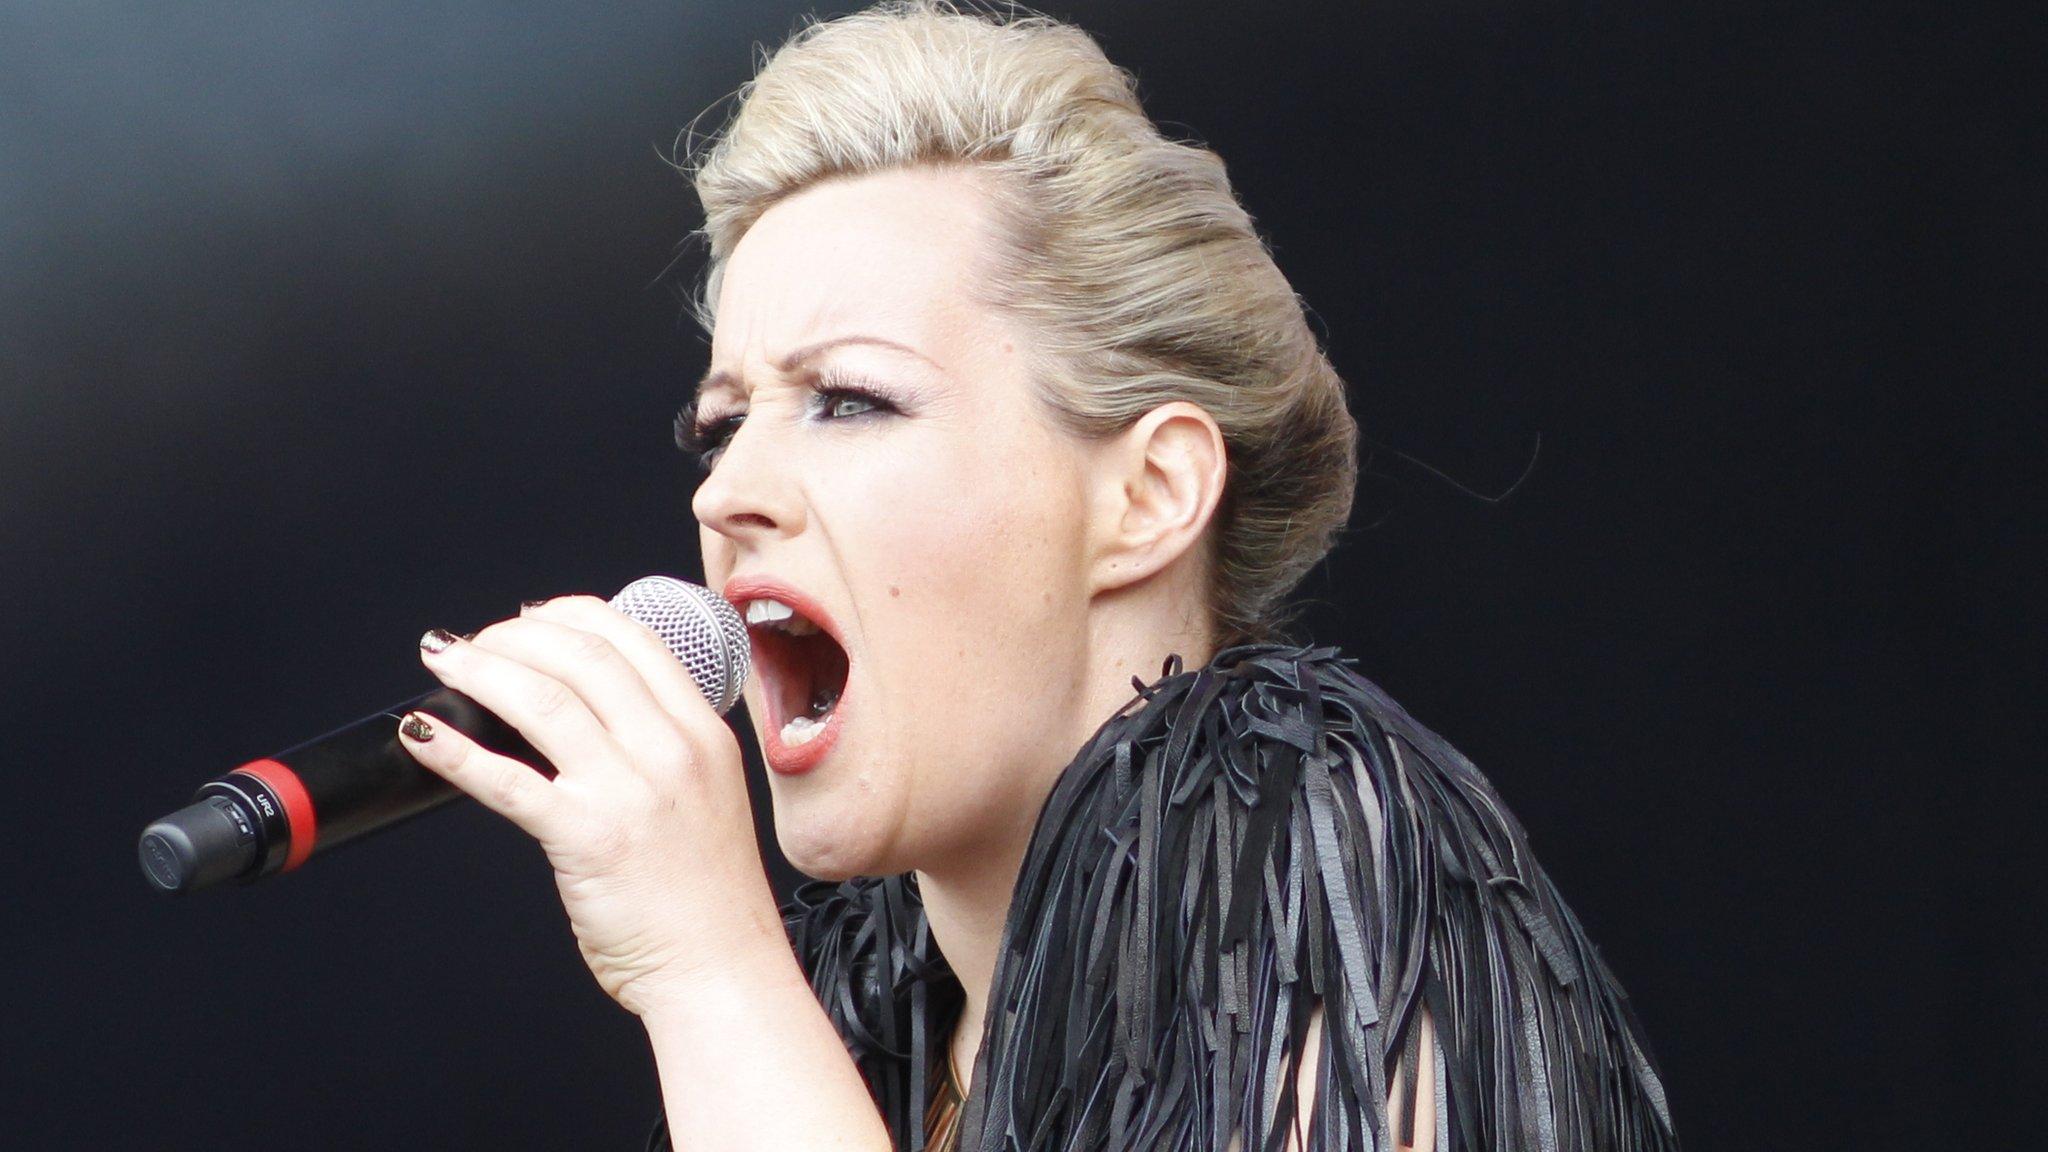 BBC News - Eden Festival announces first acts